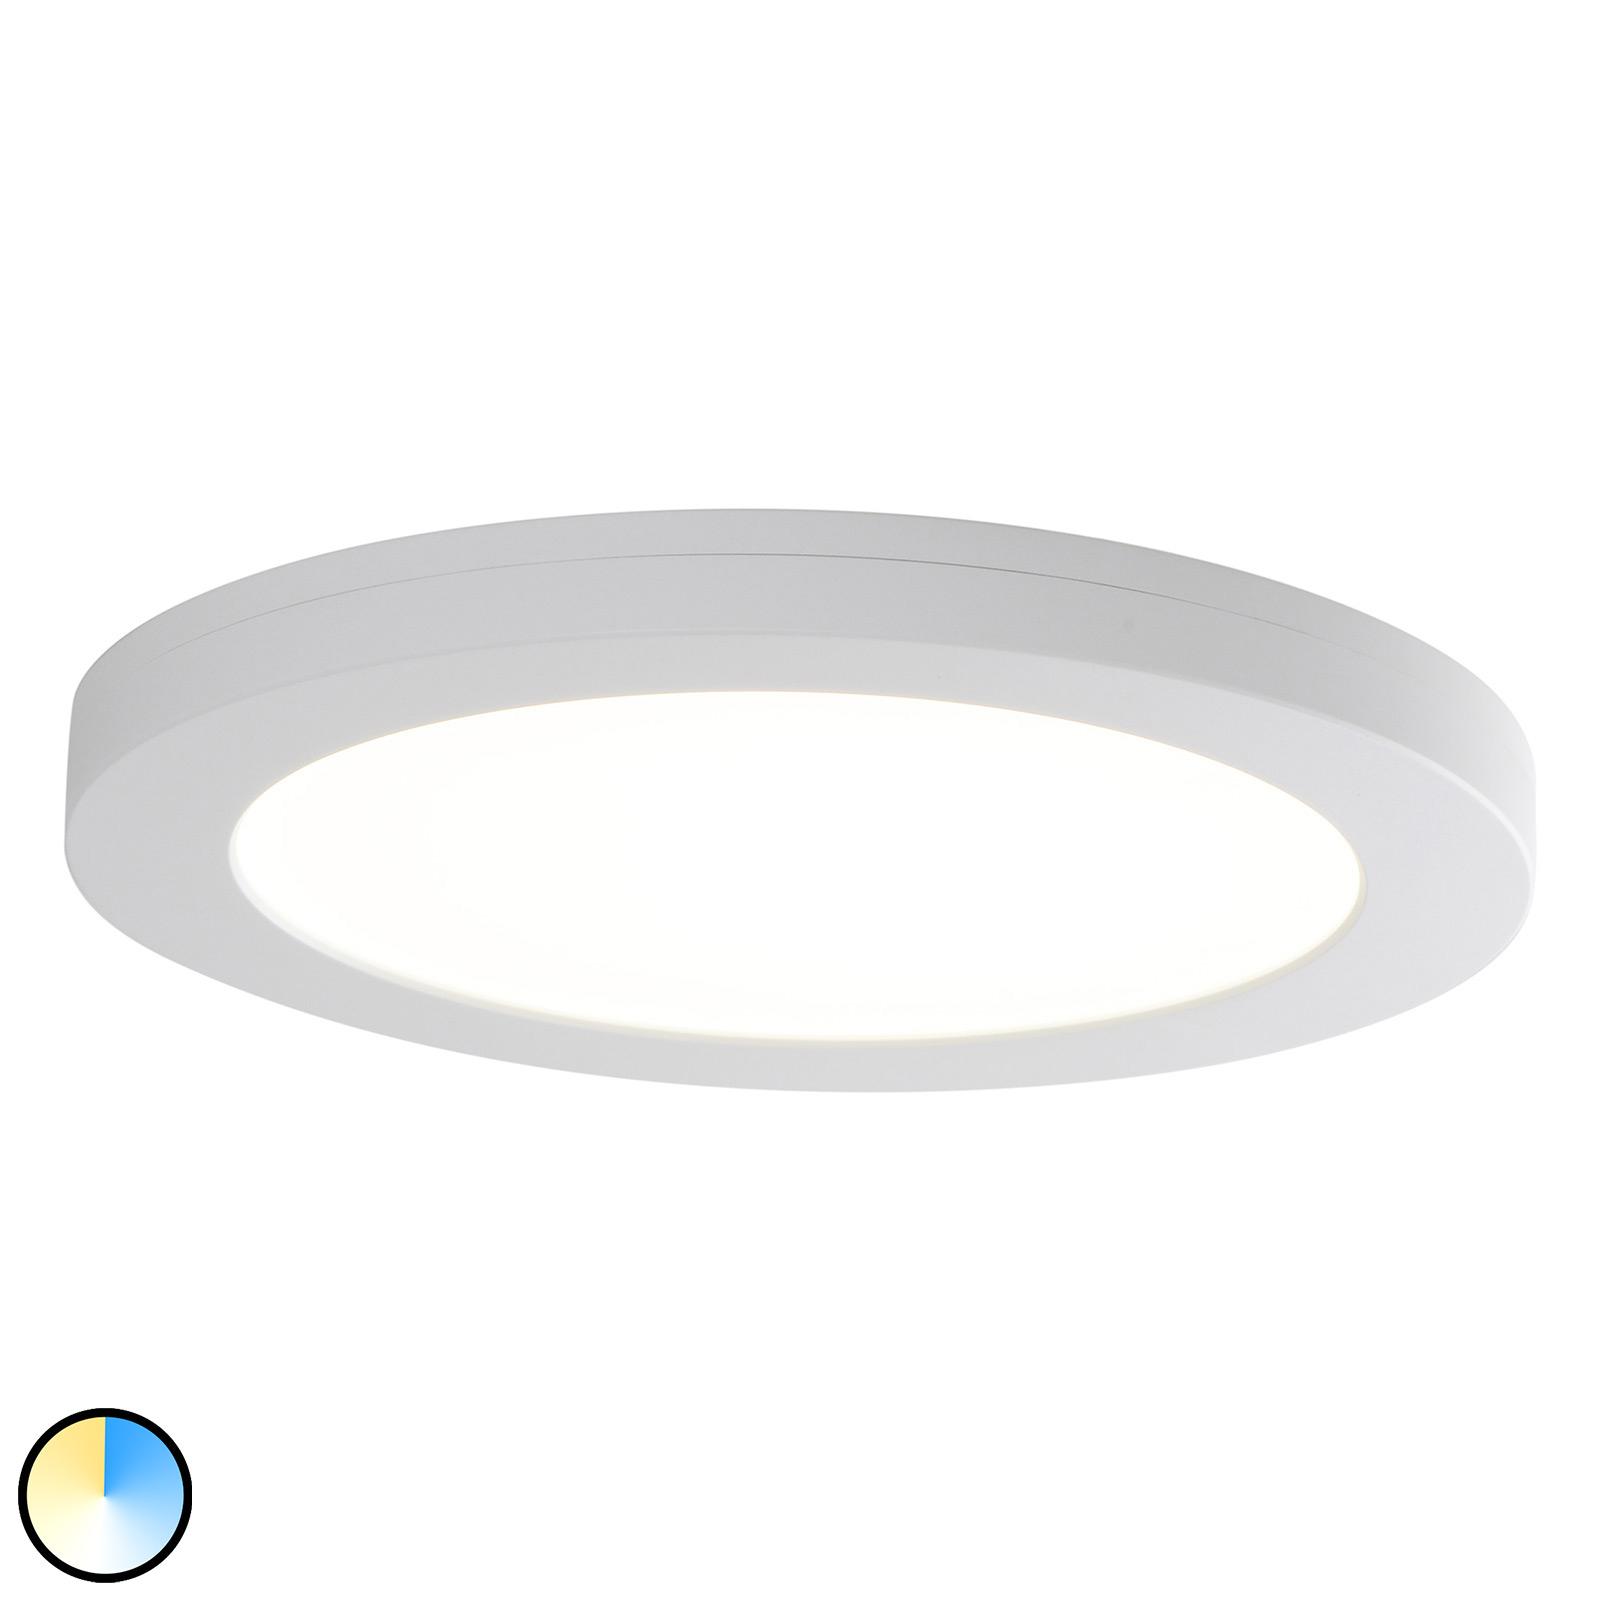 LED-uppovalaisin Bonus, halkaisija 22,5 cm